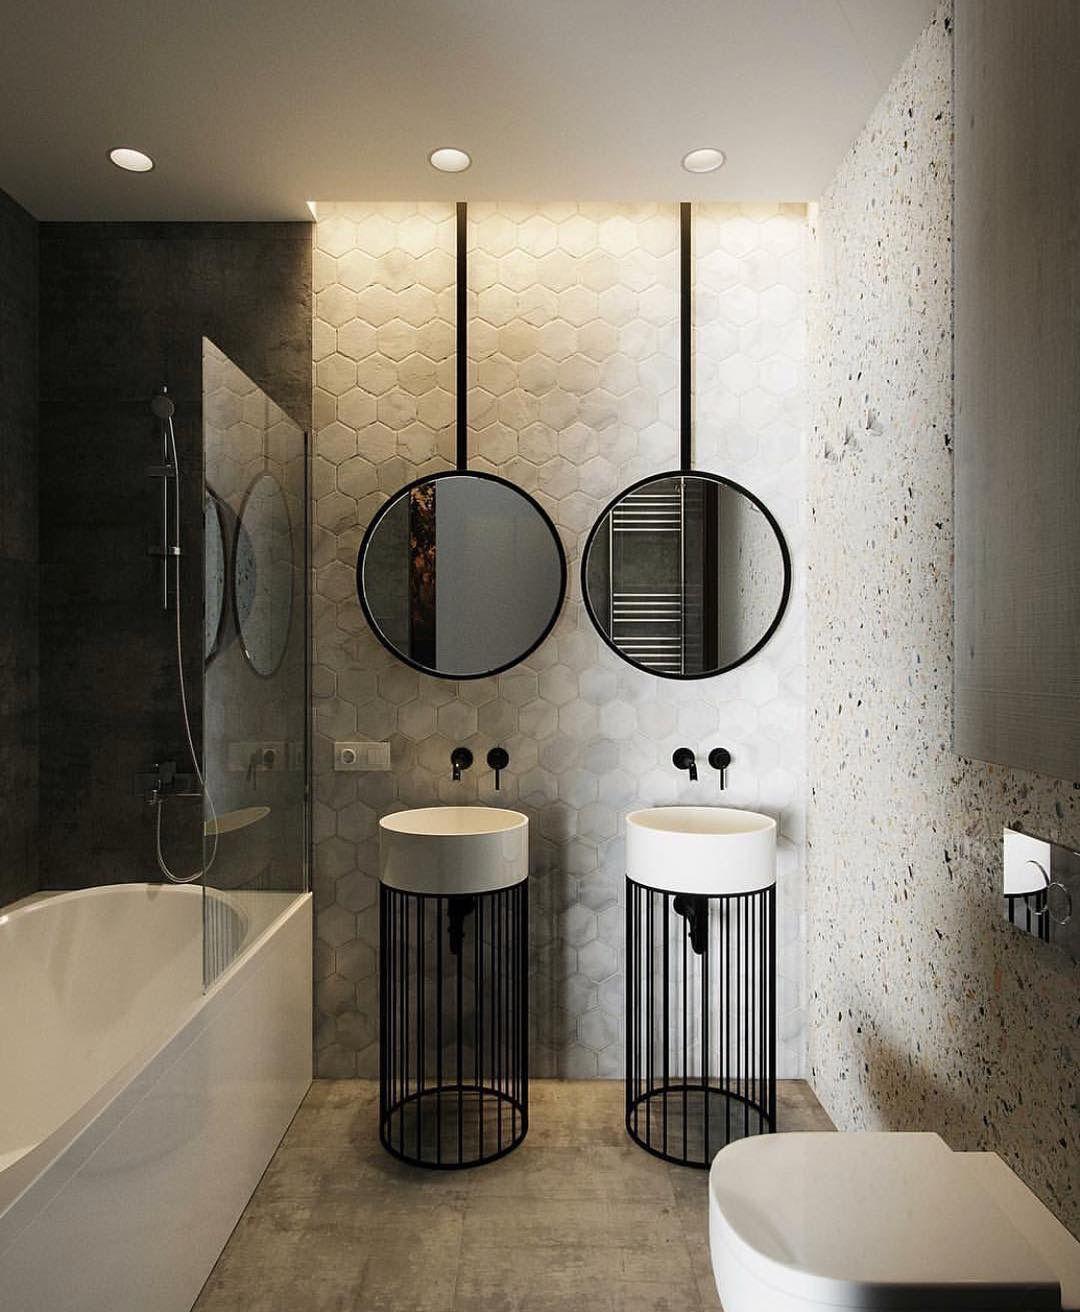 interior home design bathroom modern modern baths interior design examples loft design home decor pin by mk on bath pinterest design and